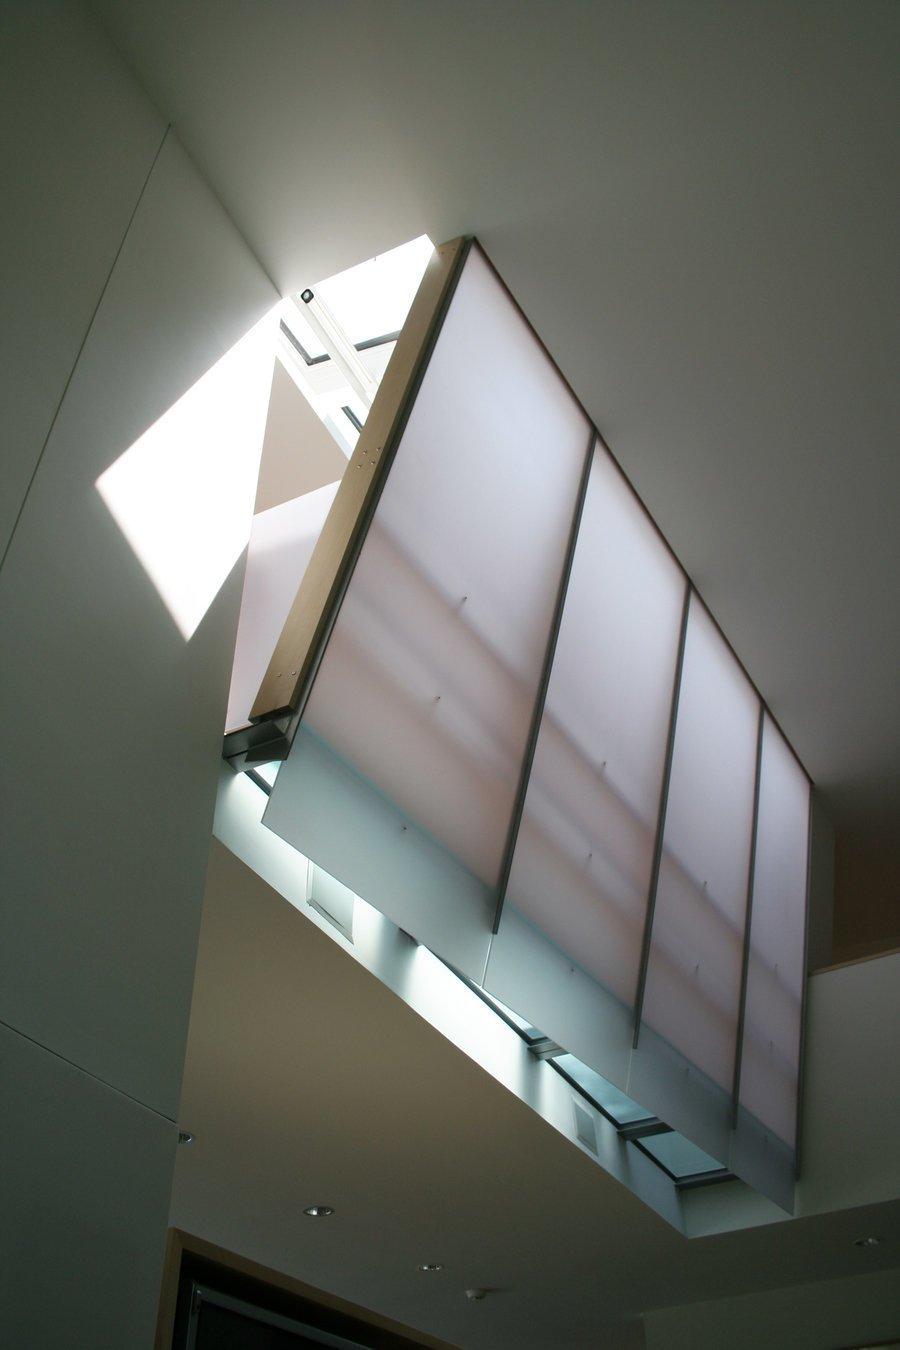 #window #light #bright #interior #inside #indoor #Princeton #NewJersey #GarrisonArchitects  Iversen Kaplan Residence by Garrison Architects